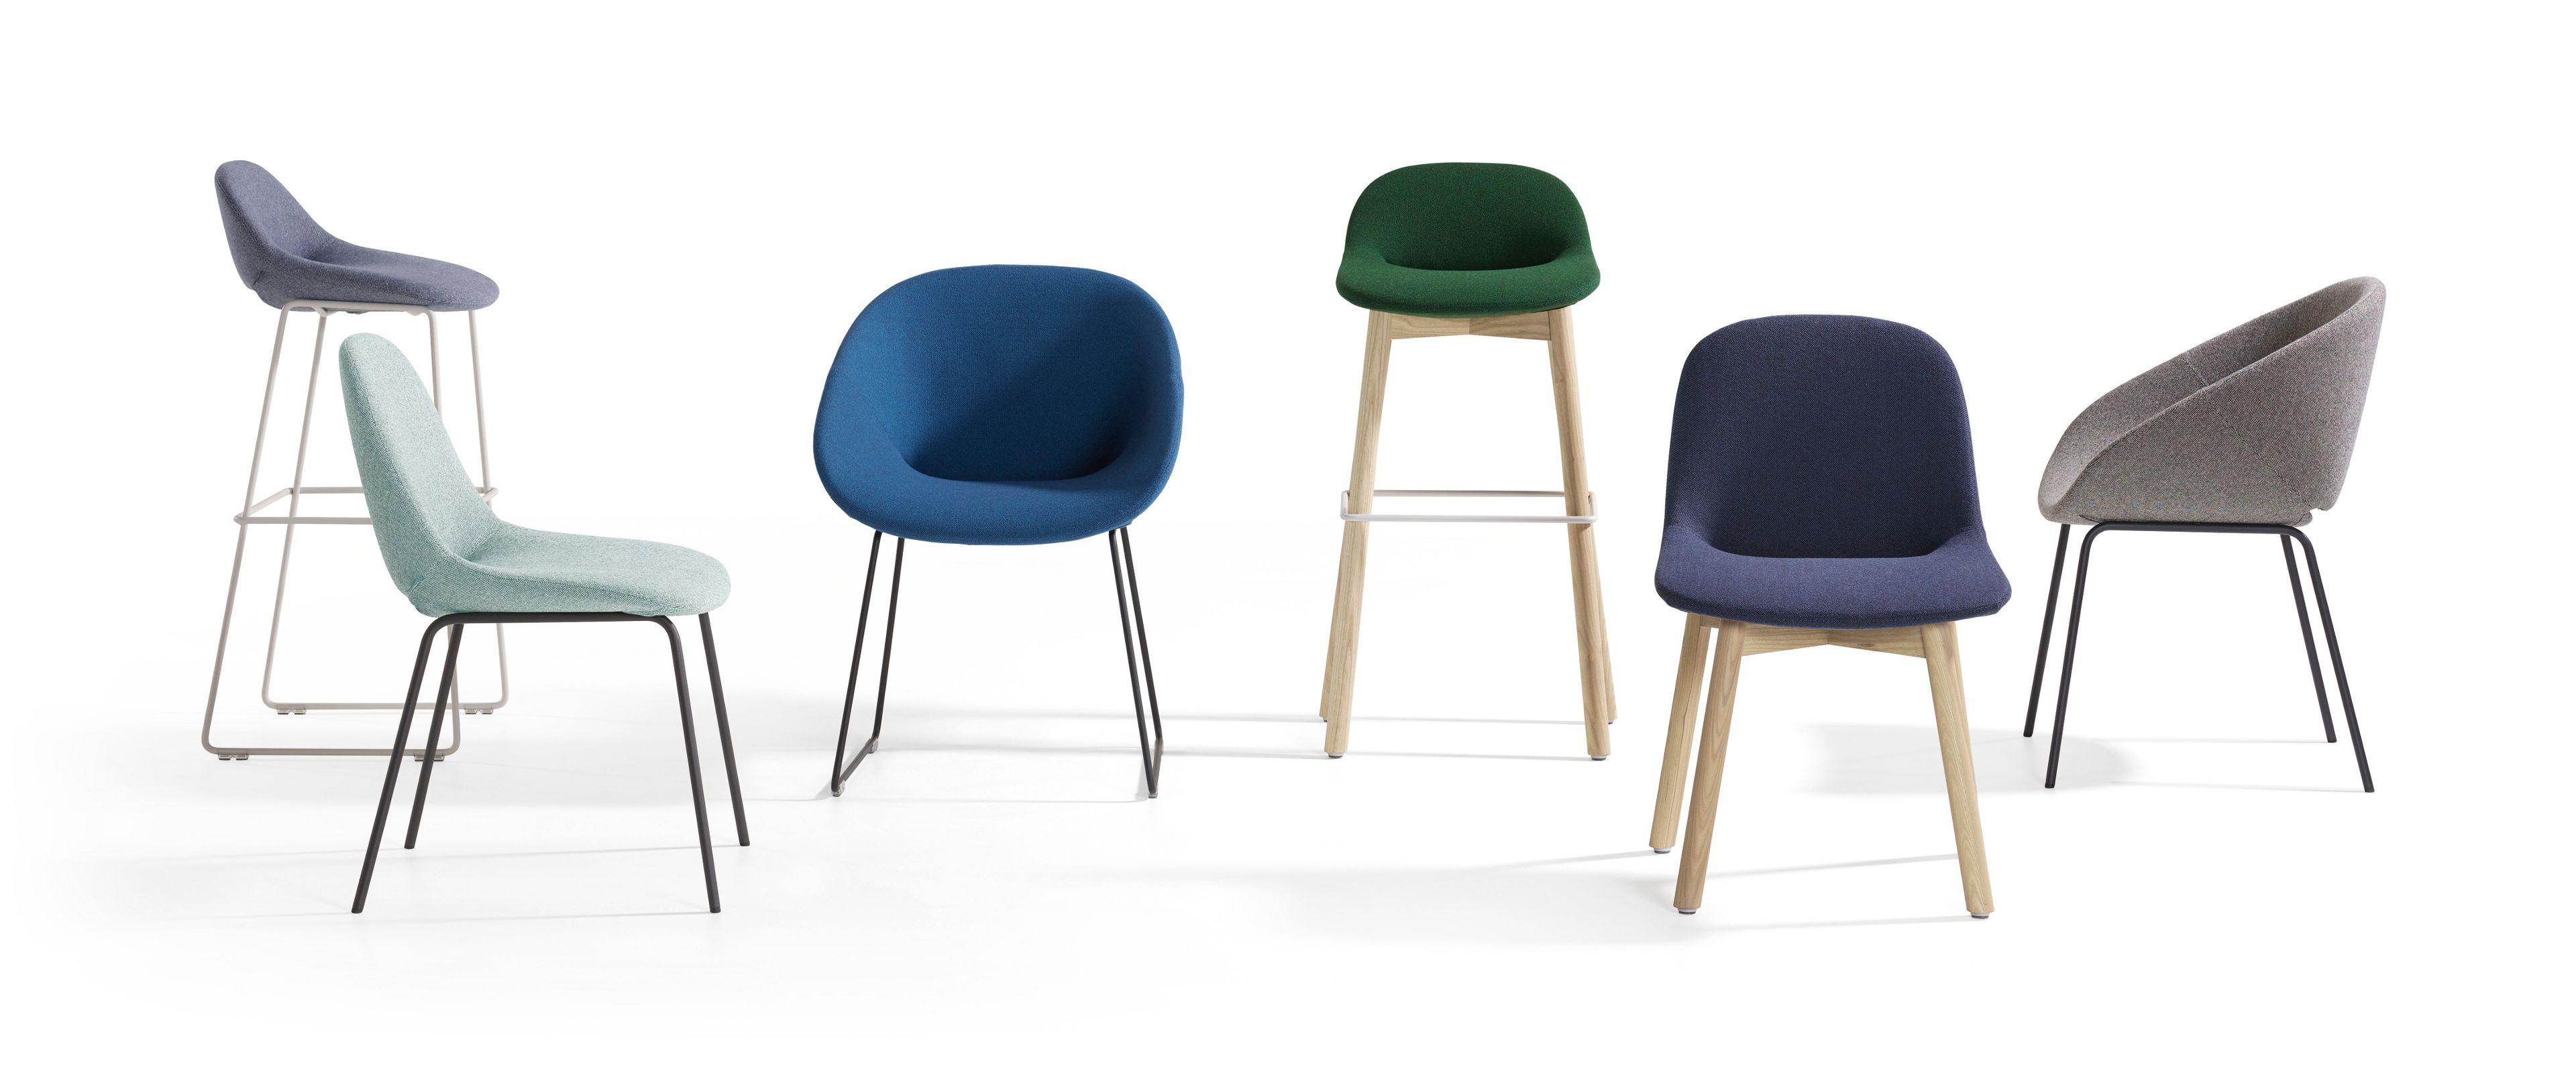 Beso sedia alta by artifort design khodi feiz for Sedia alta